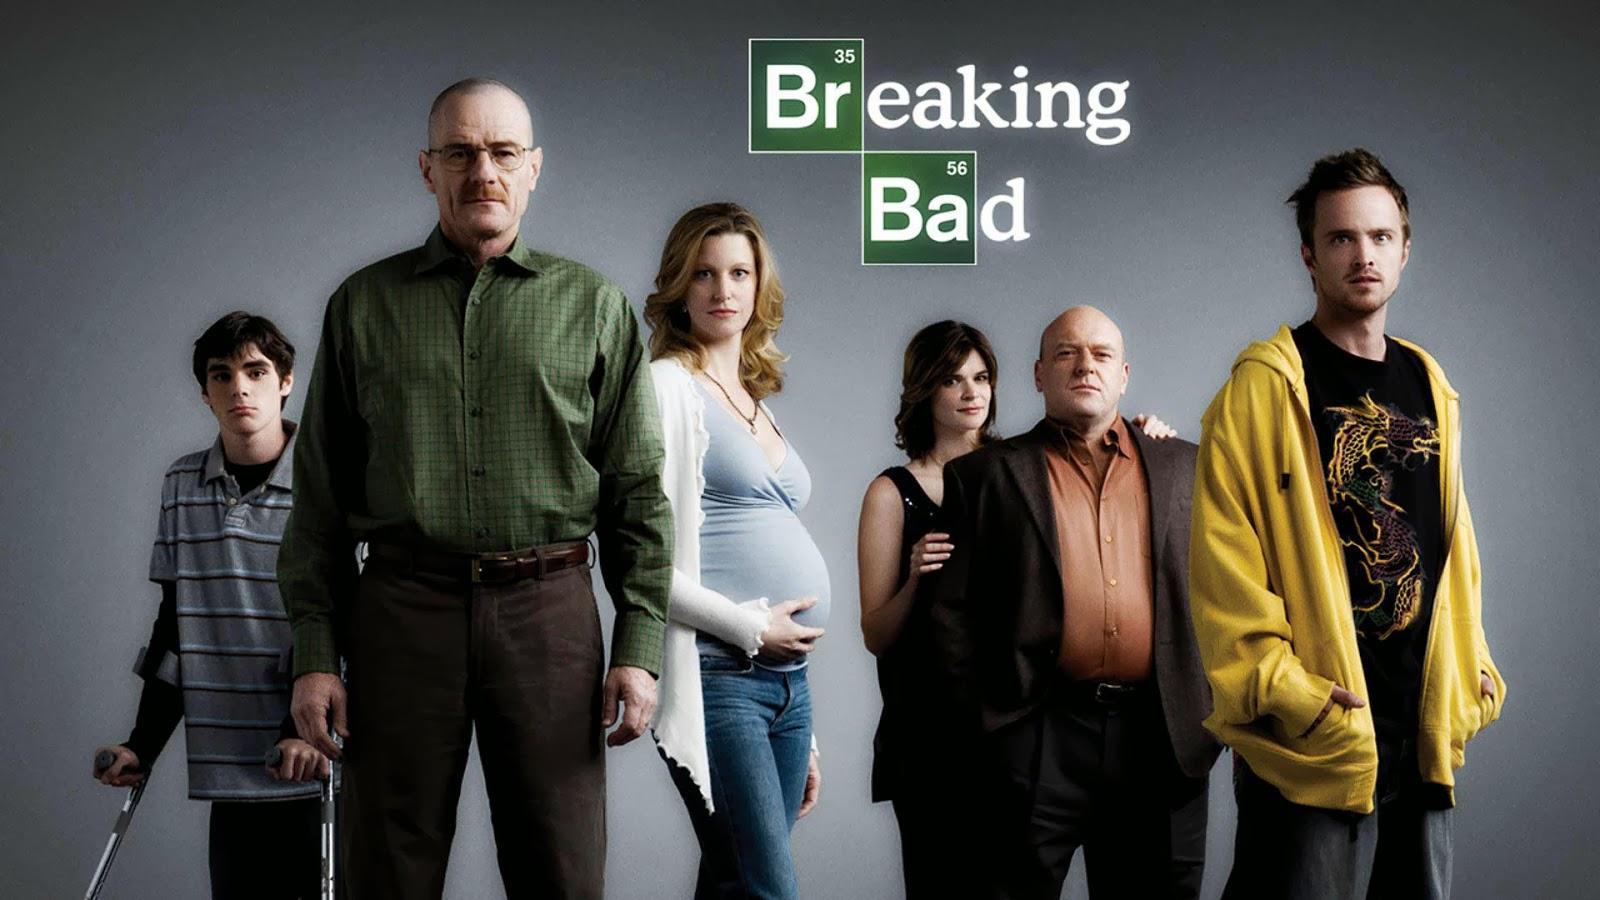 breaking bad 50 wallpapers - photo #28